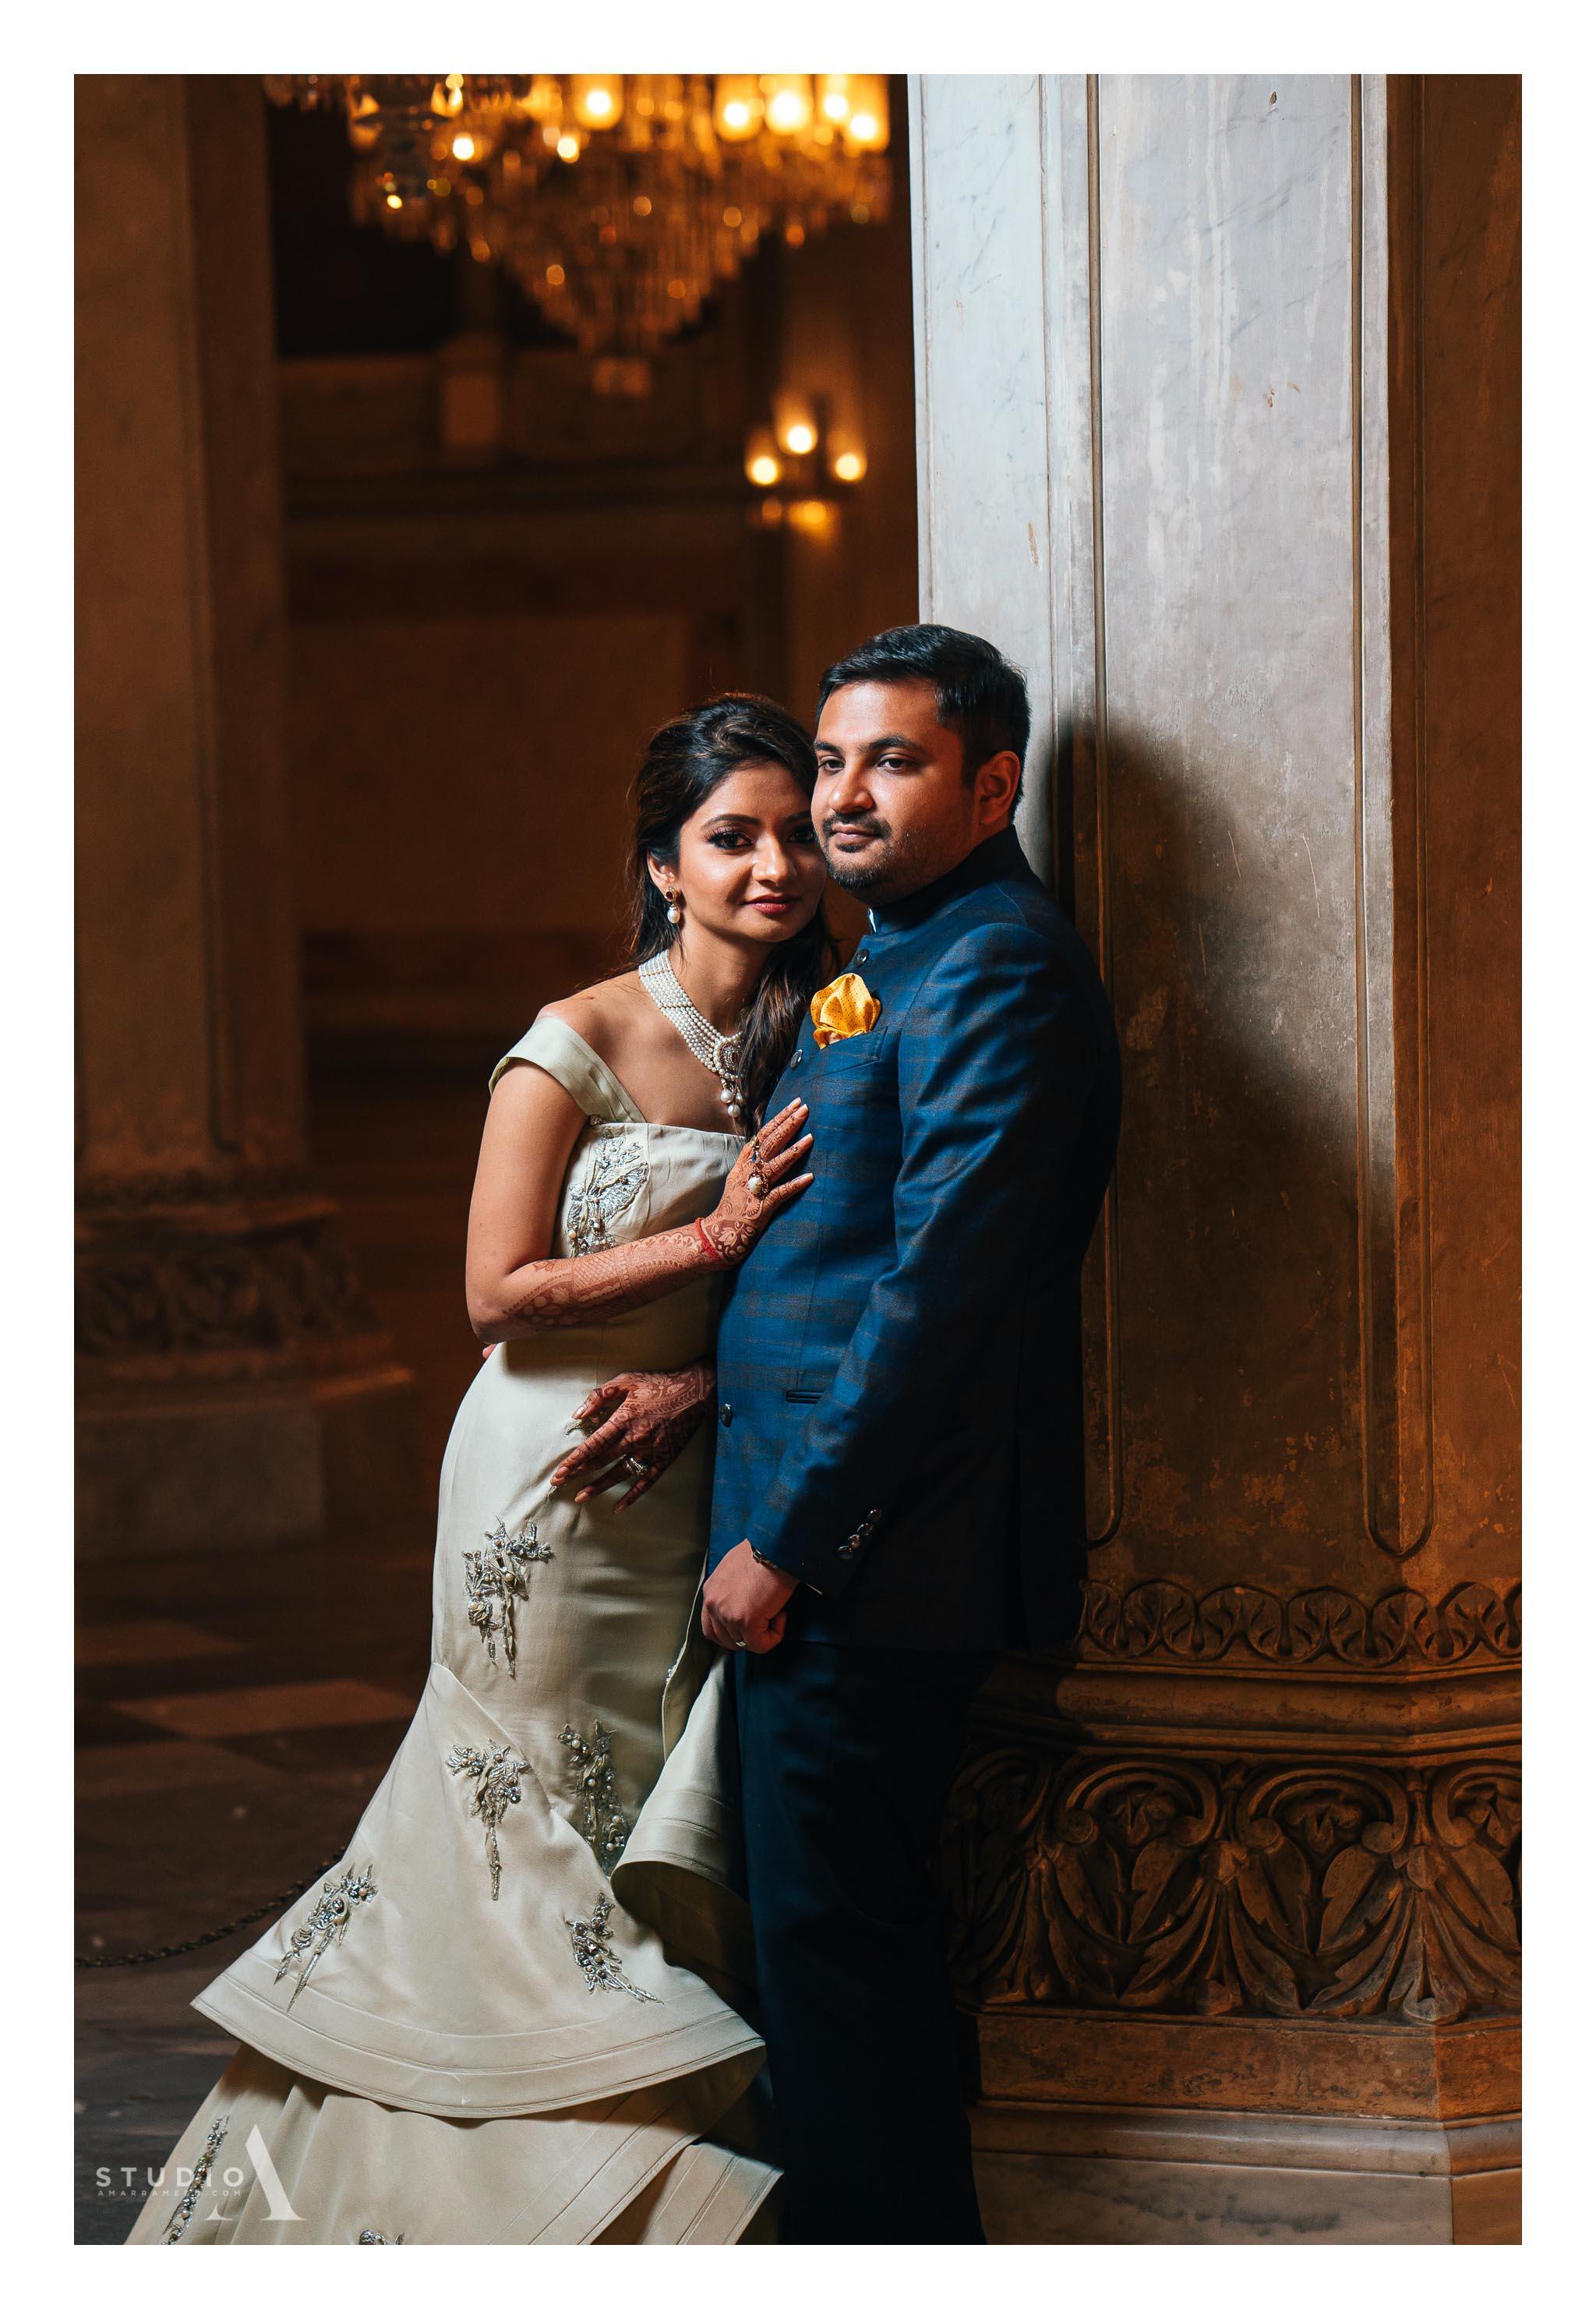 parsi-wedding-hyderabad-chennai - 28